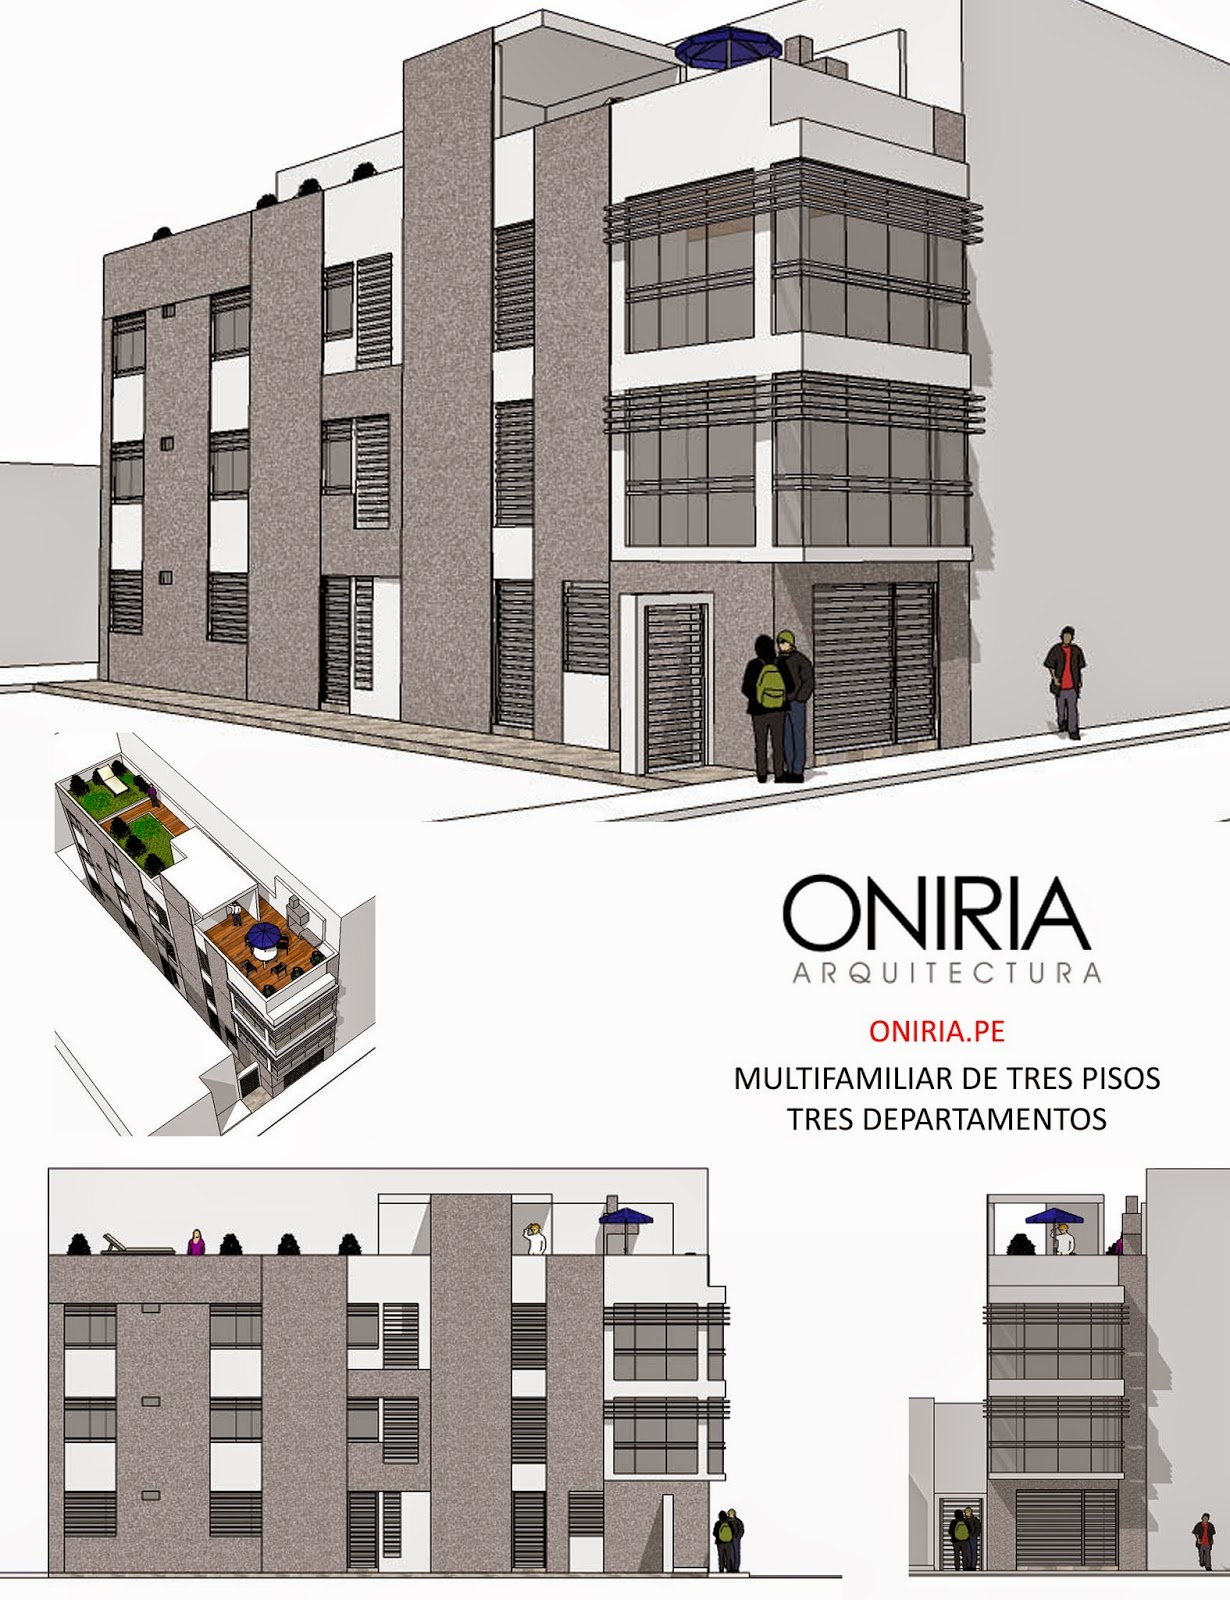 Cristian campos dise o de viviendas multifamiliares for Diseno de viviendas